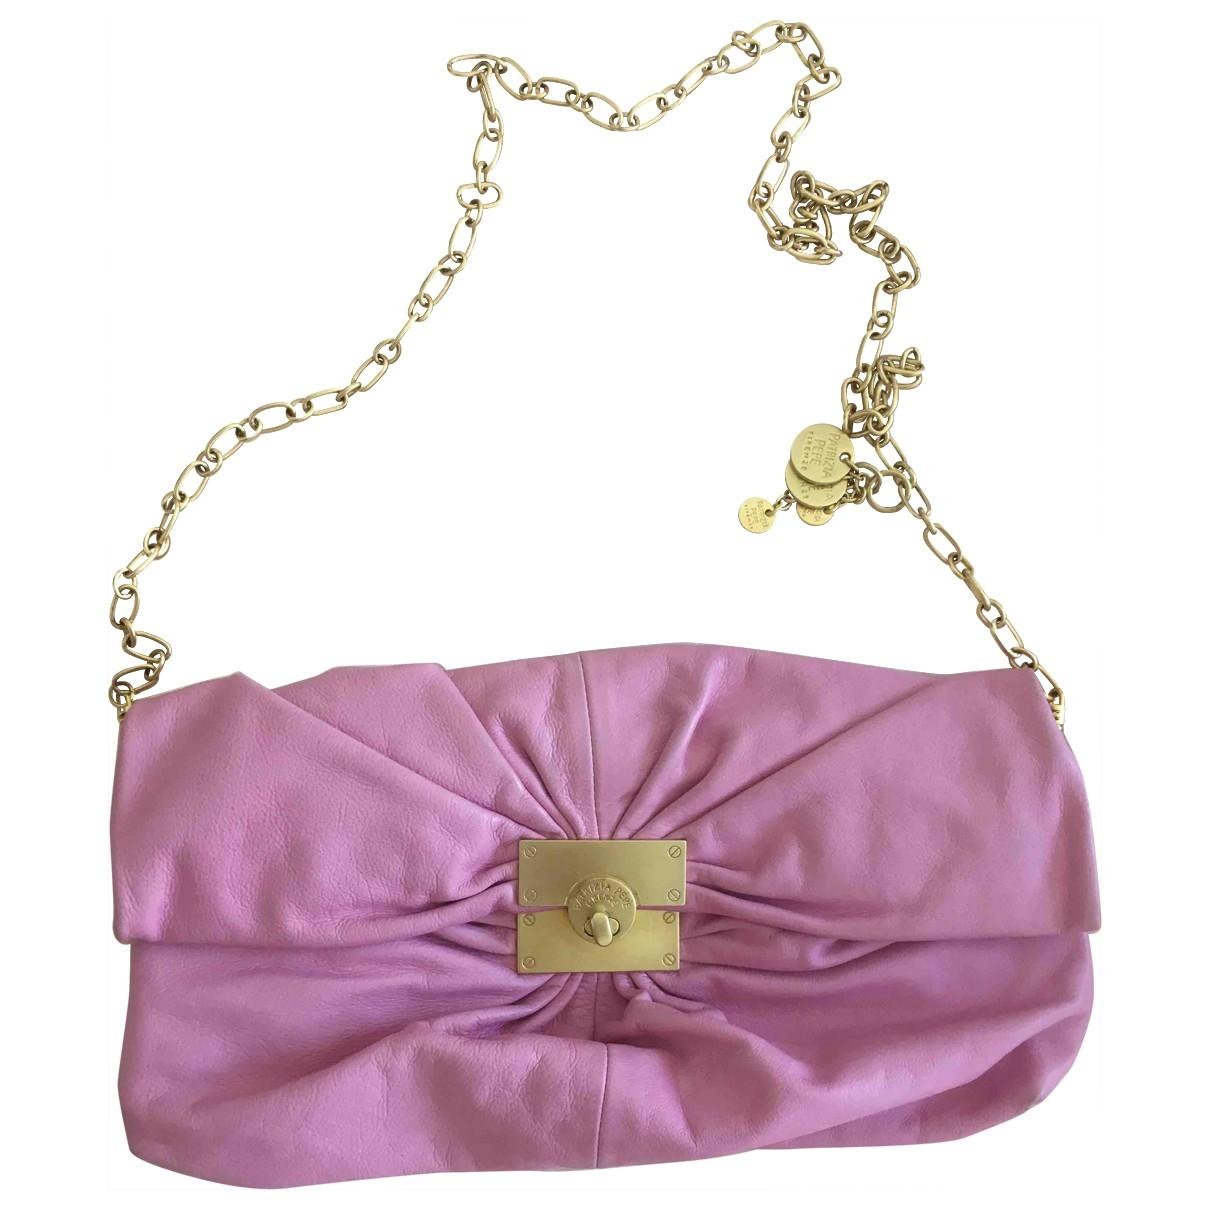 Patrizia Pepe \N Pink Leather handbag for Women \N